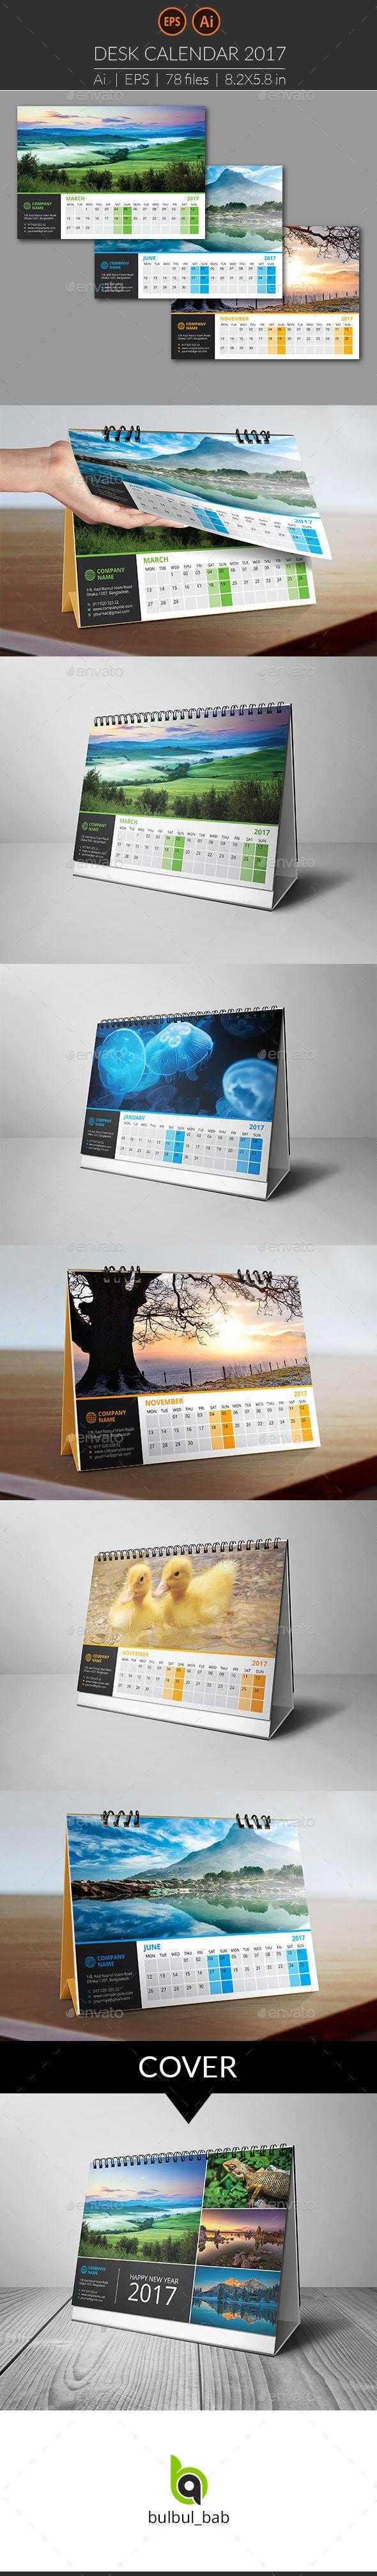 Desk Calendar 2017 Template Vector EPS, AI Illustrator